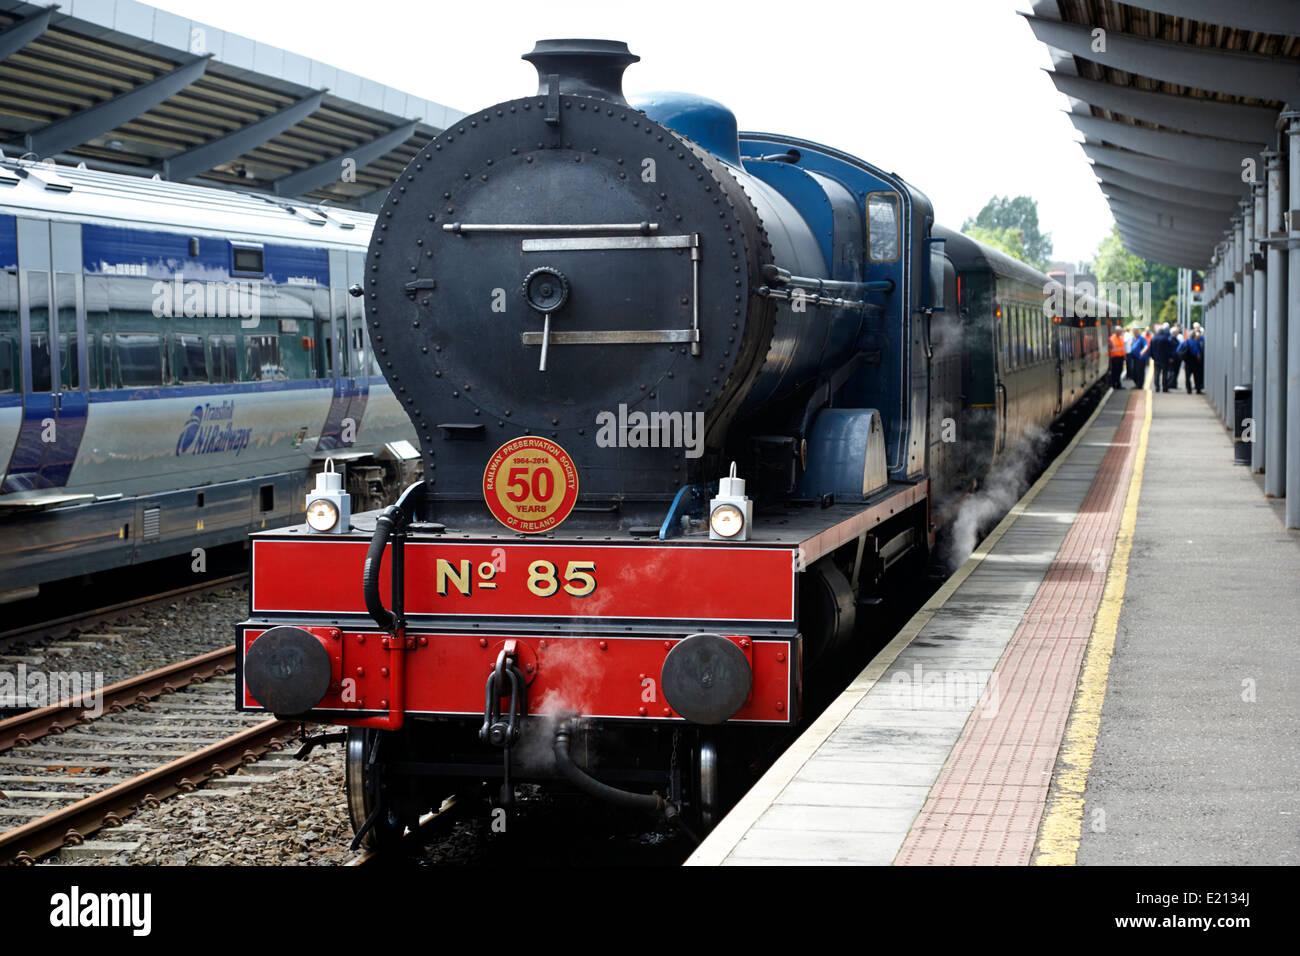 steam locomotive train at bangor station northern ireland - Stock Image